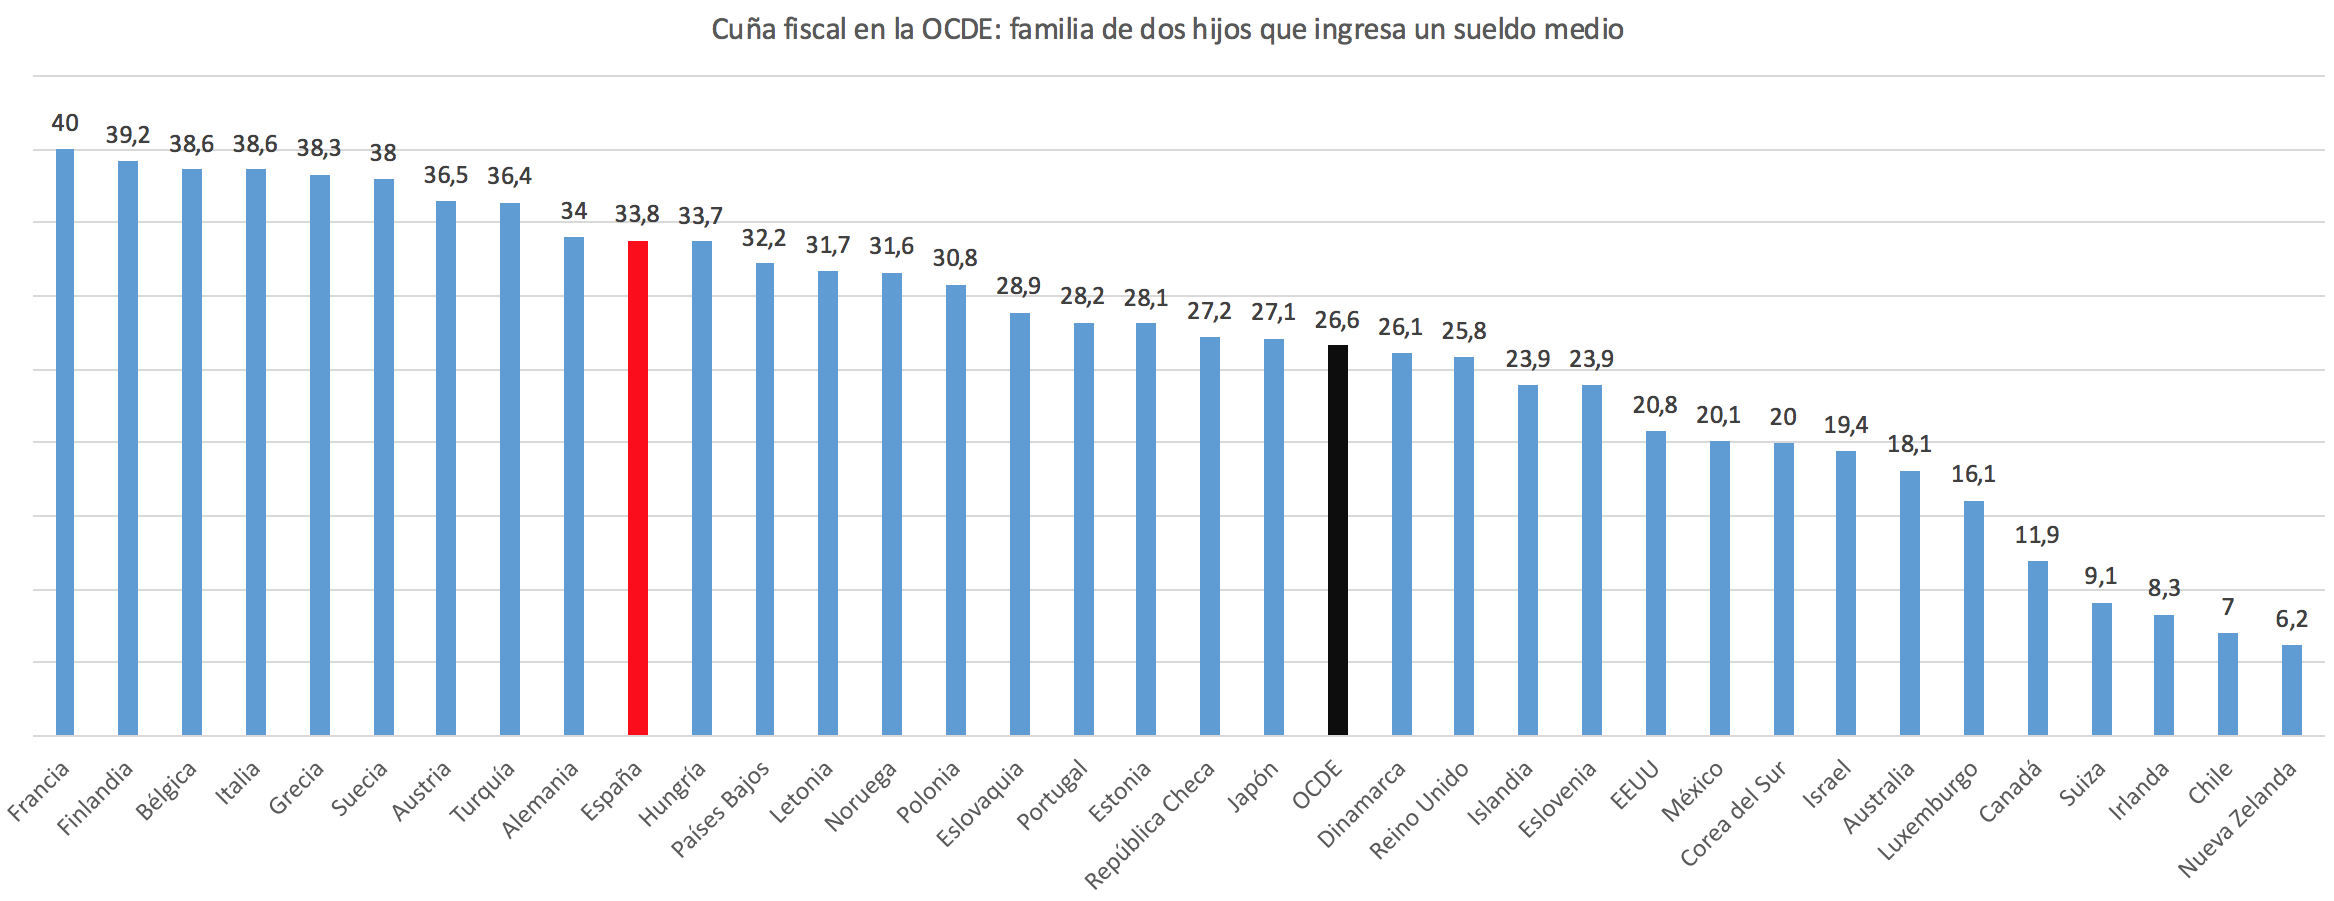 Espana-OCDE-Impuestos-Familias-Taxing-Wa